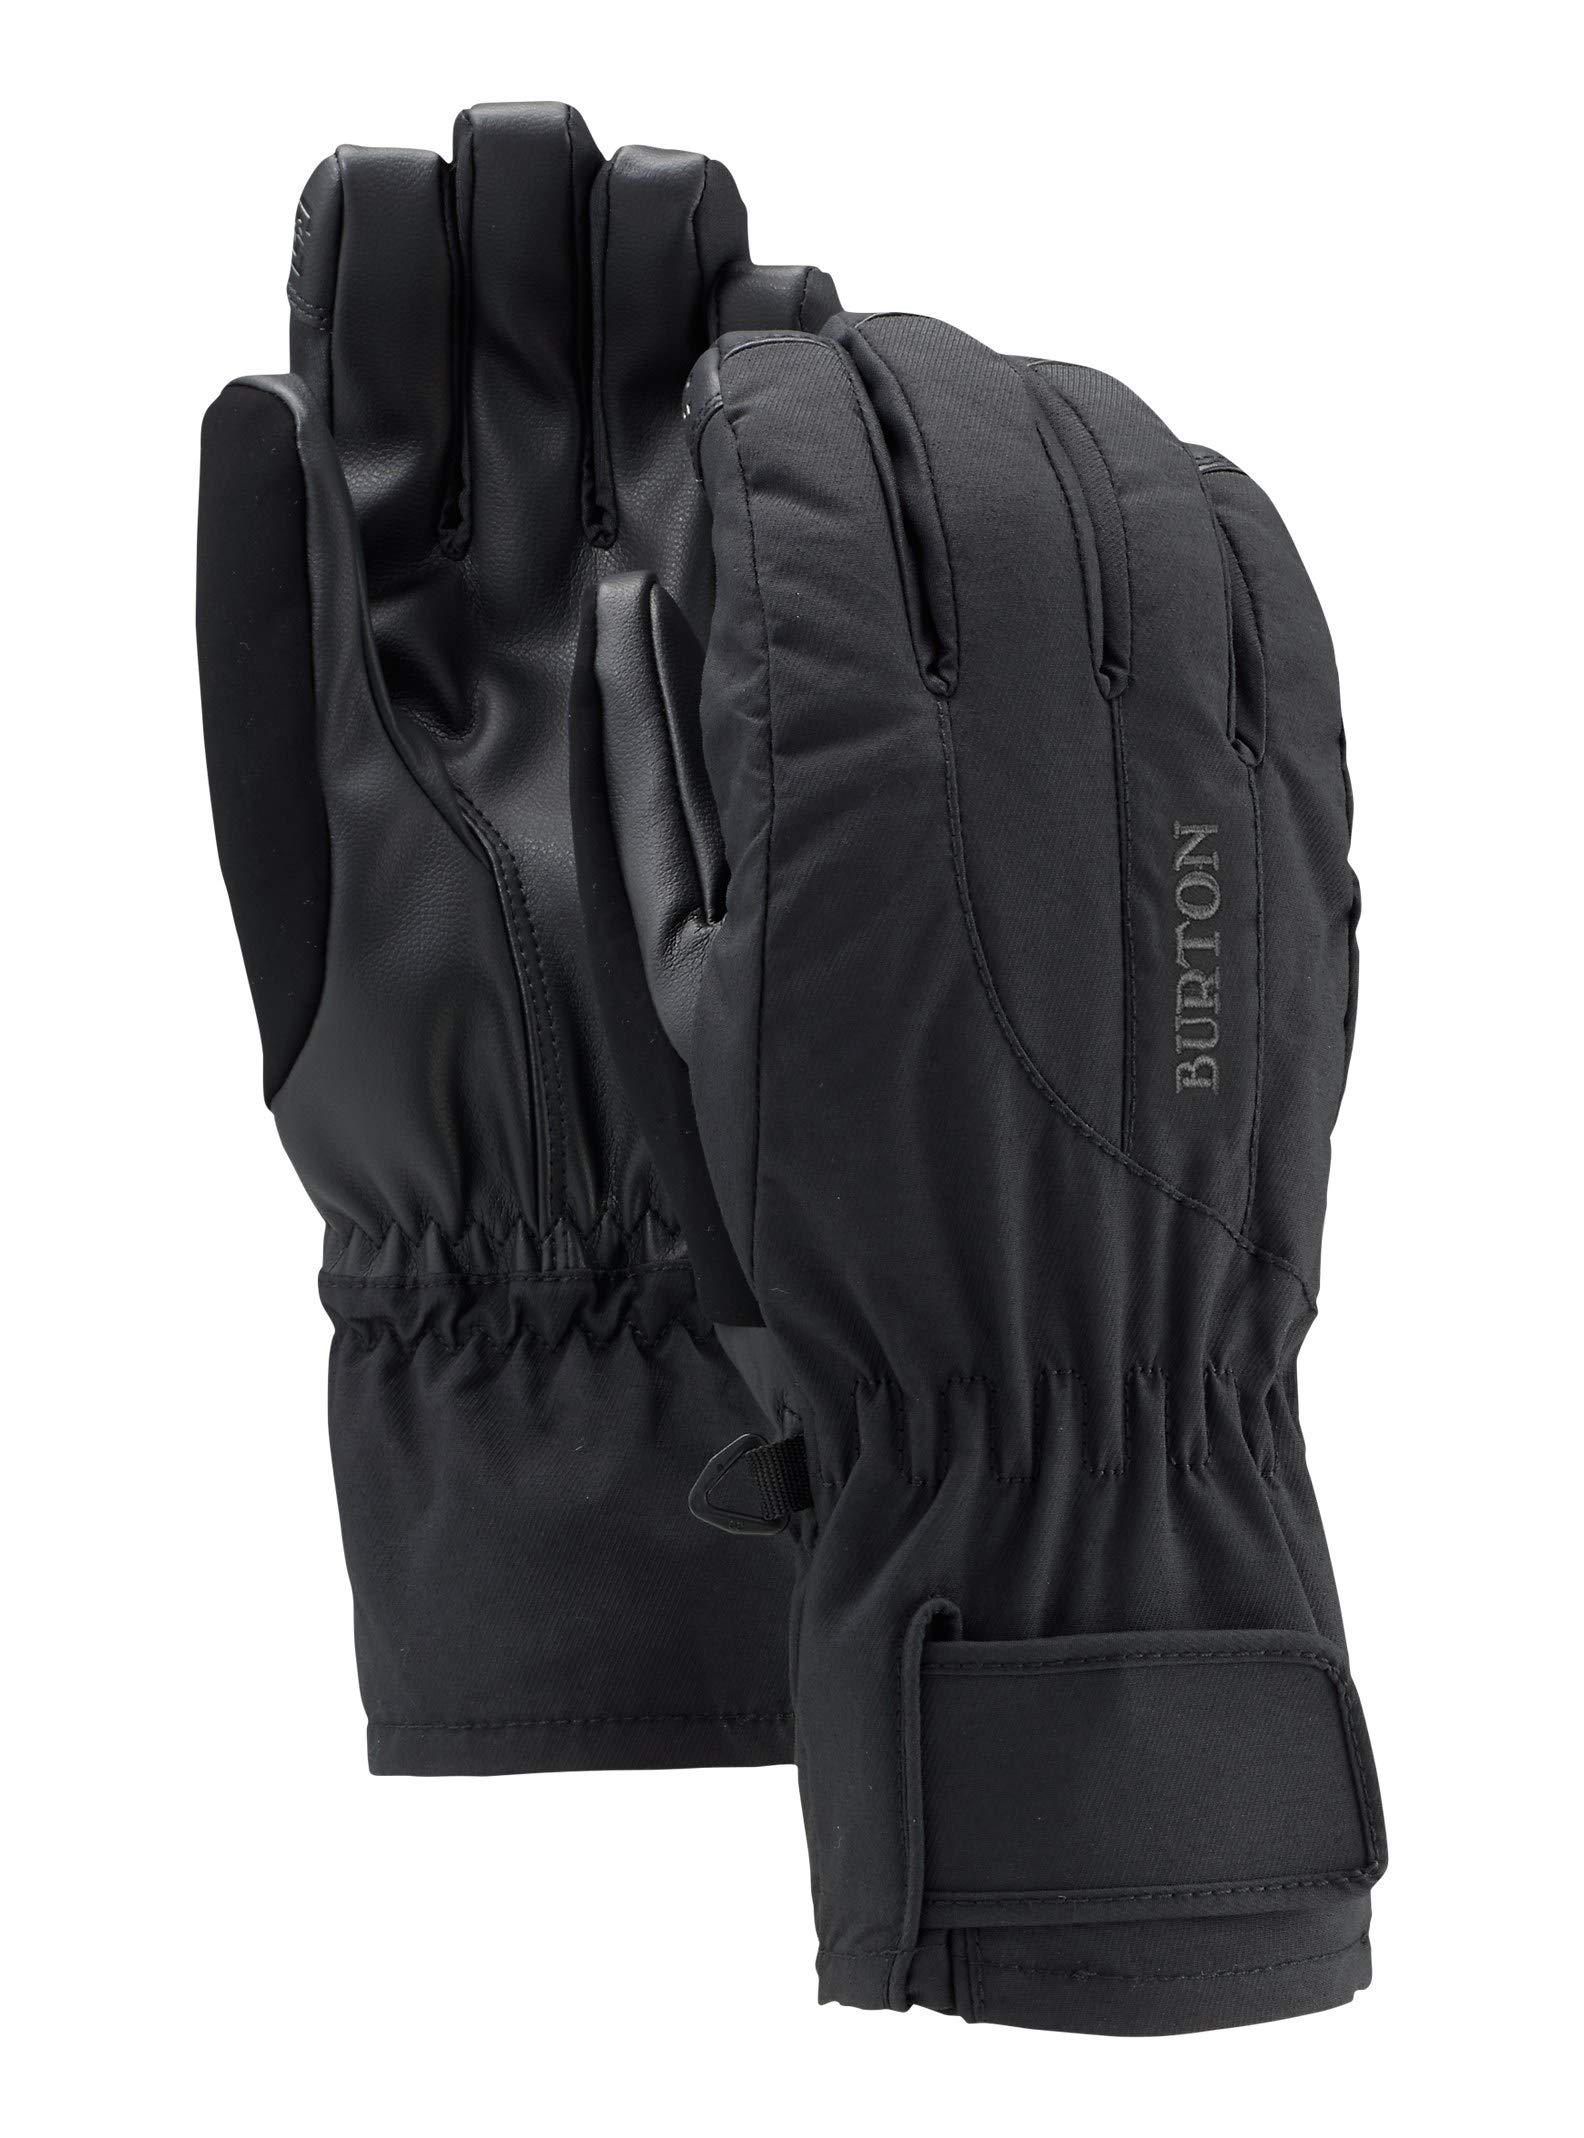 Burton Women's Profile Under Gloves, True Black, X-Small